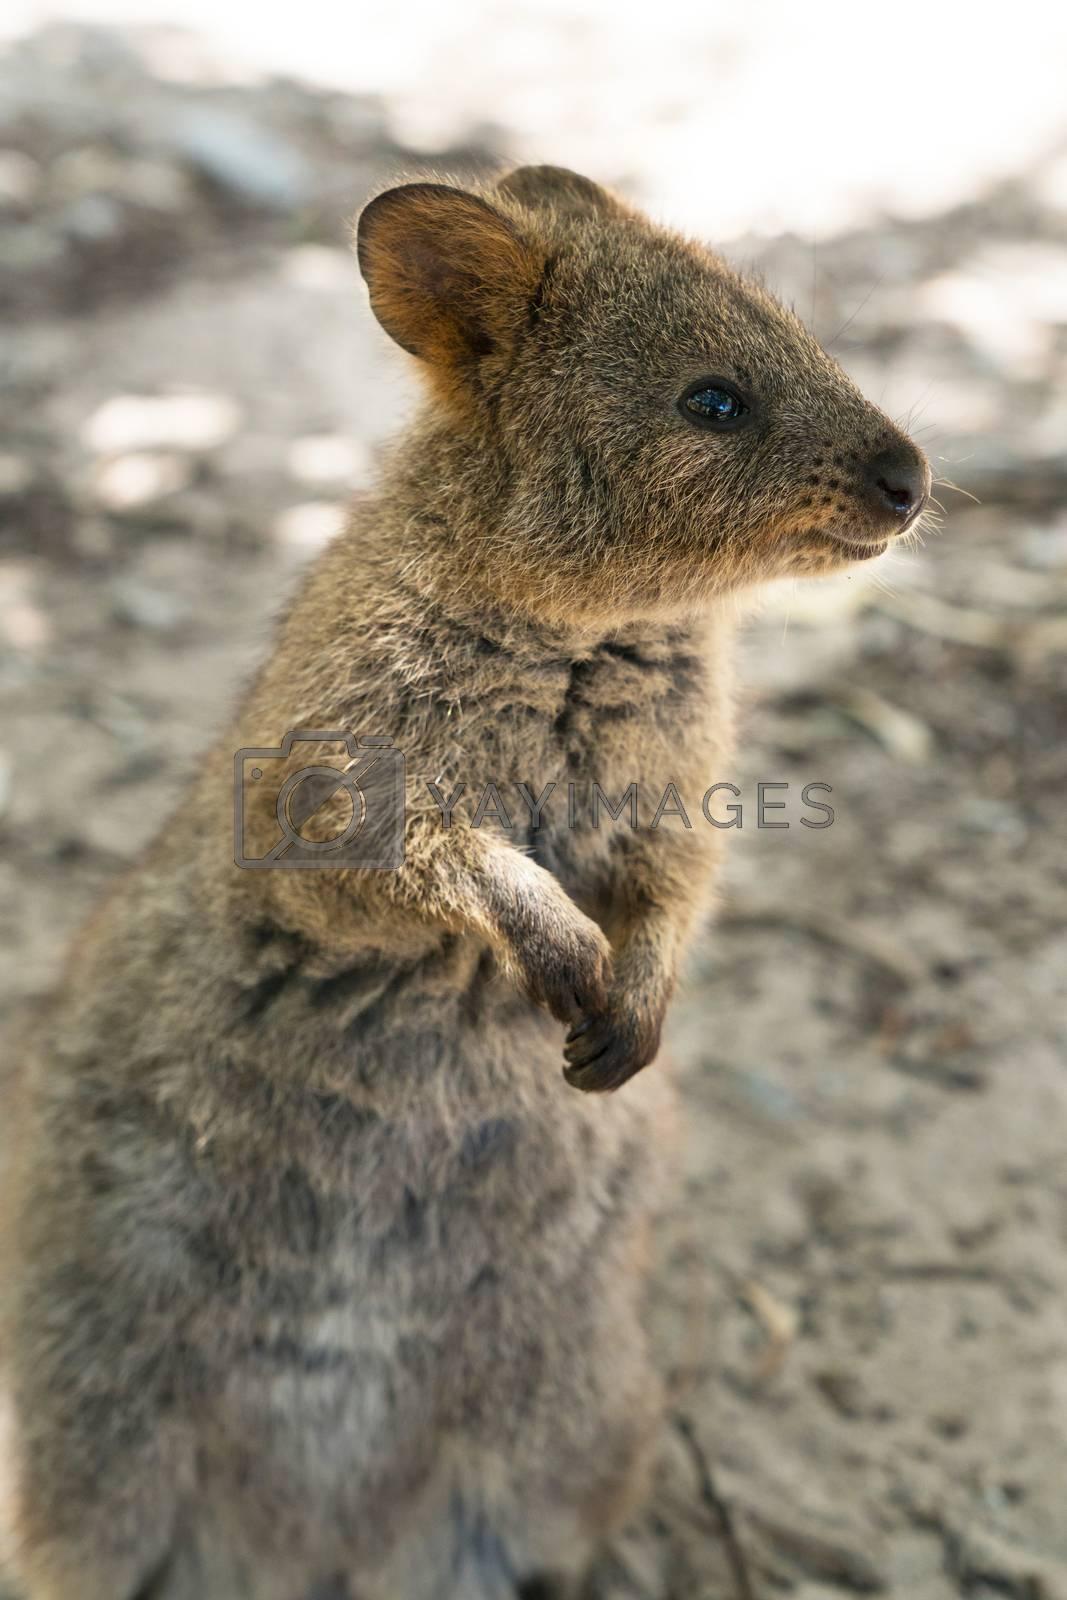 Quokka (Setonix brachyurus), image was taken on Rottnest Island, Western Australia